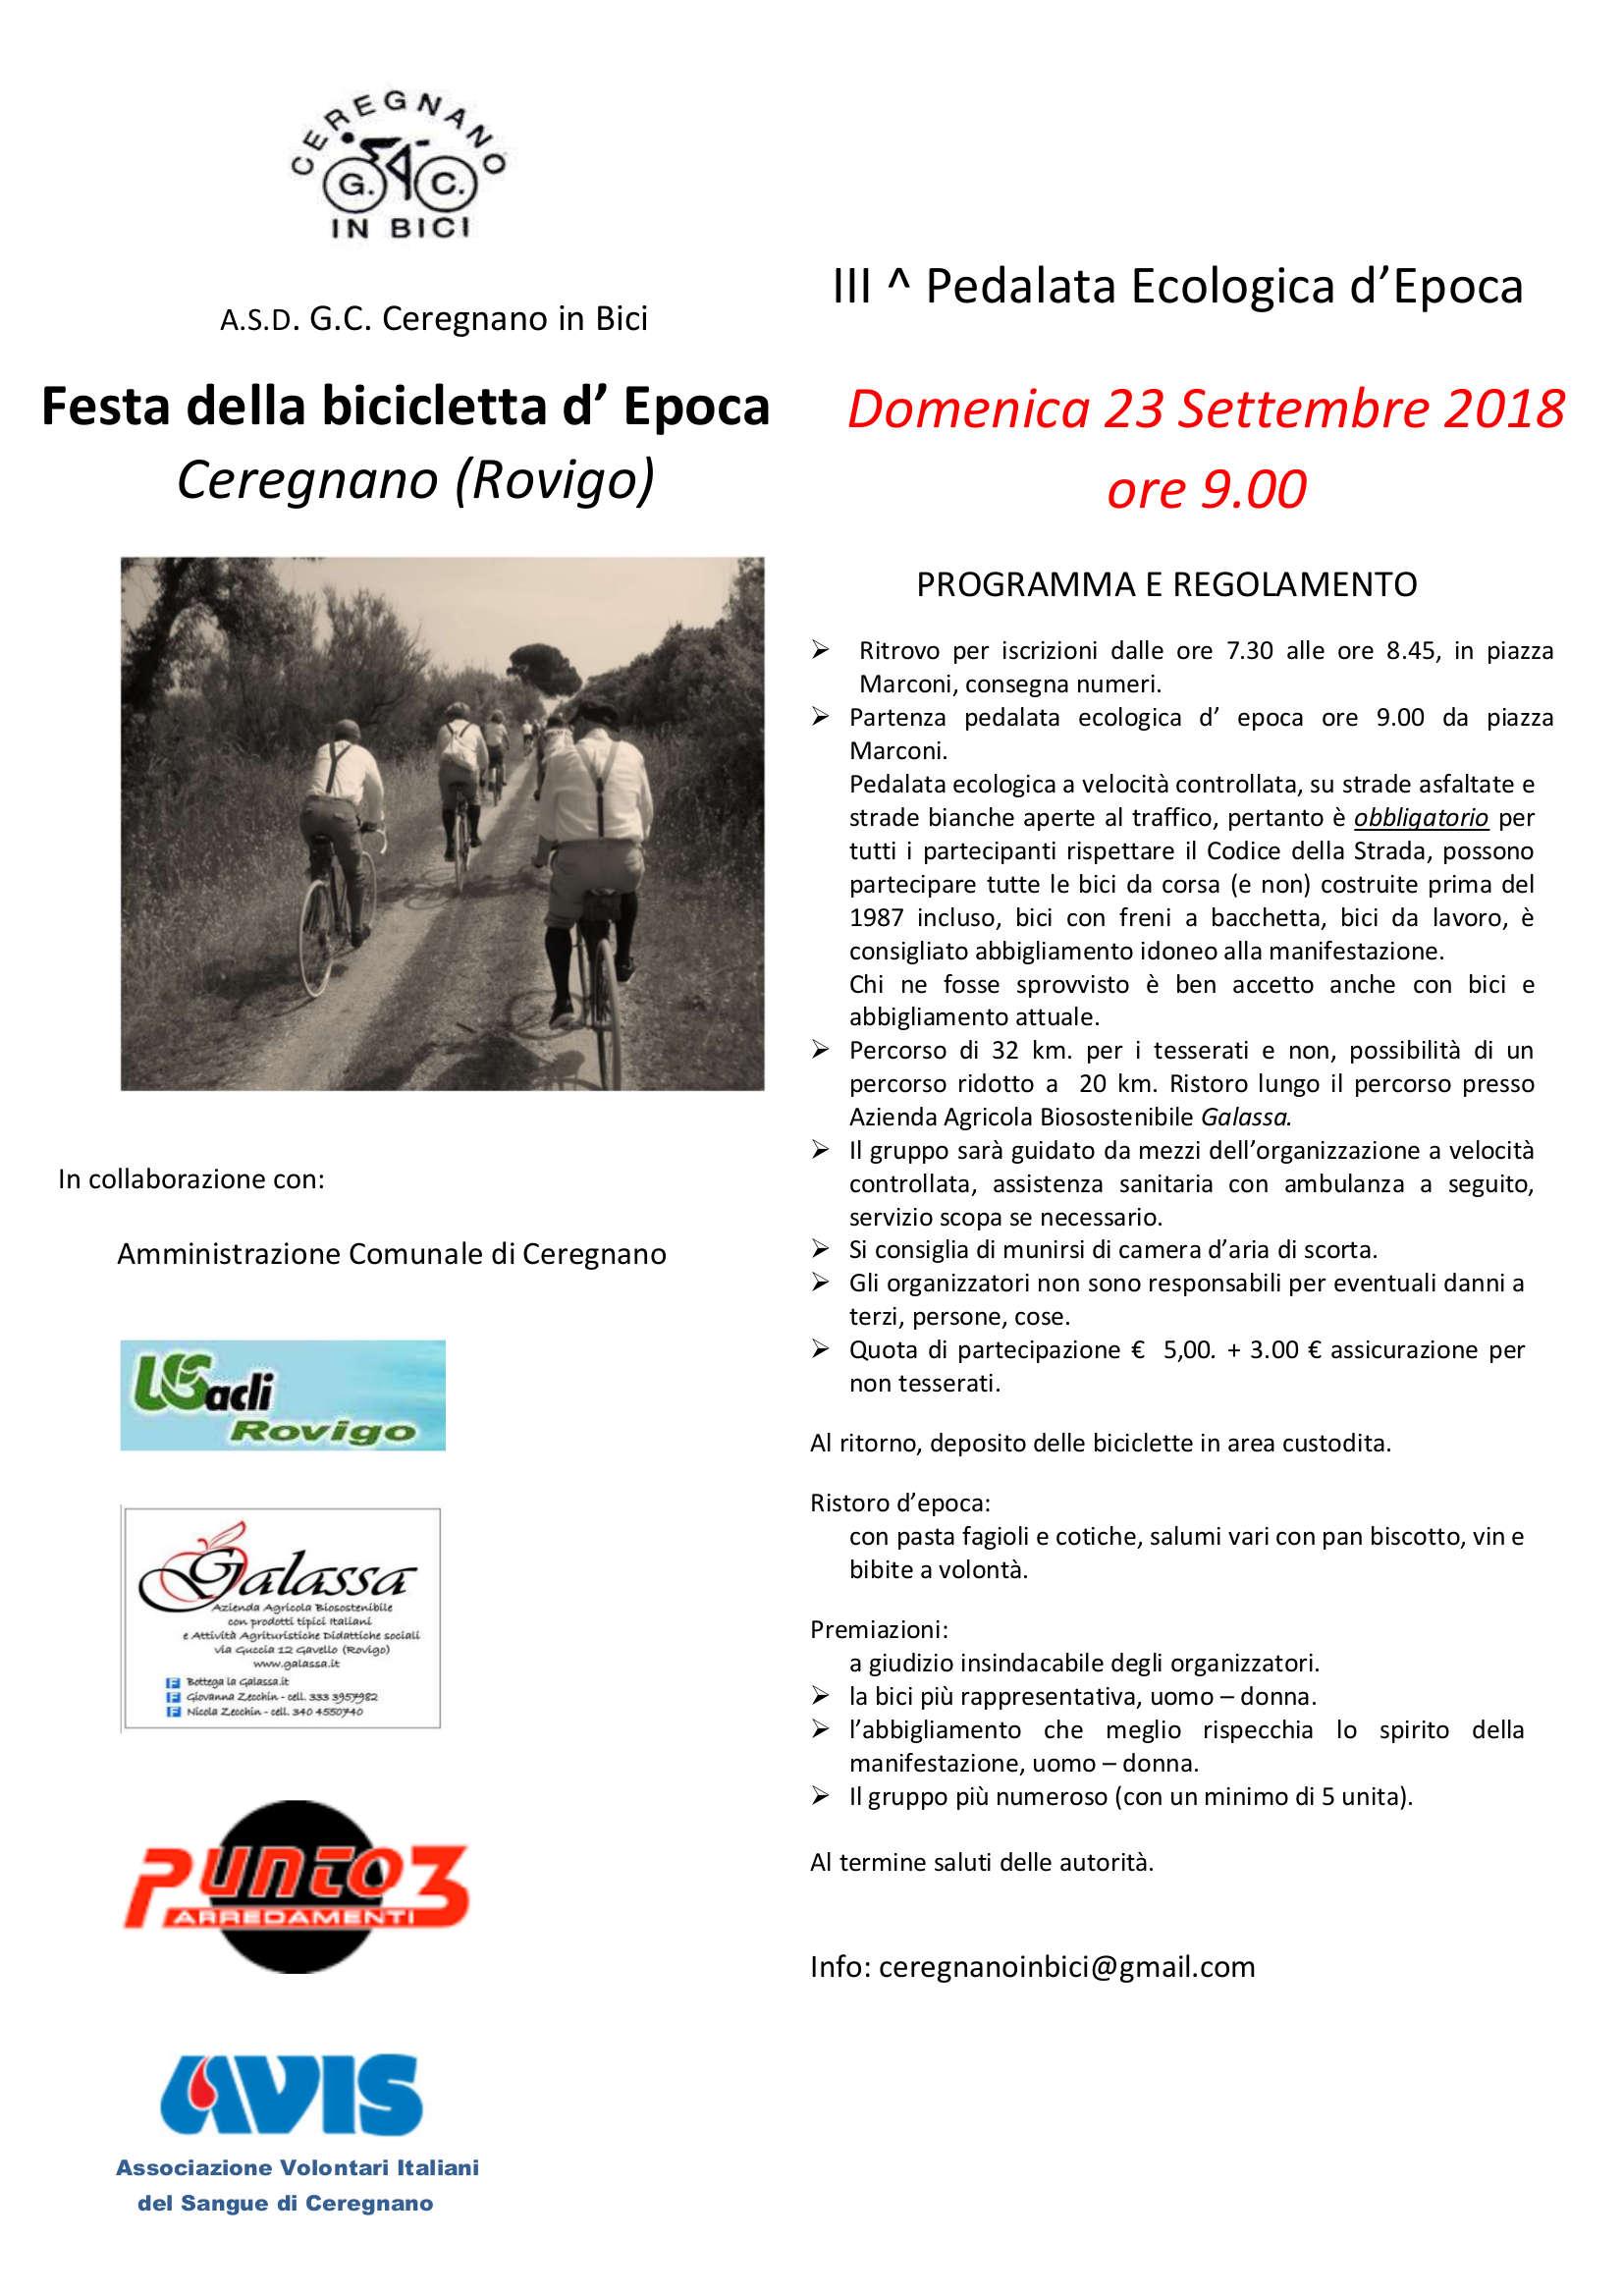 Ciclopedalata Epoca con programma e regolamento 2018